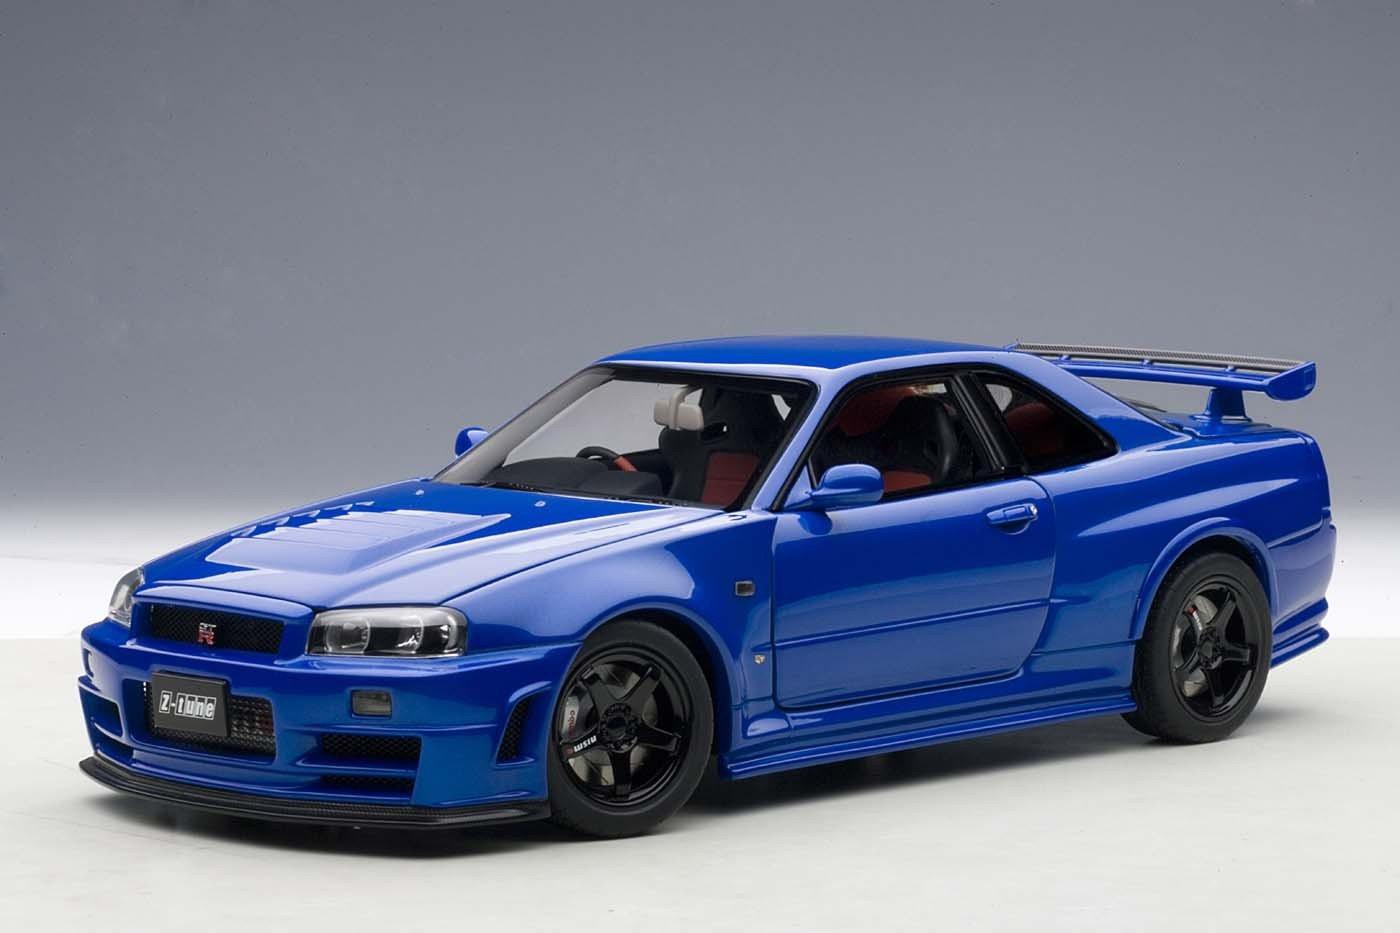 Nissan Skyline Gtr R34 Nismo Z Tune Bayside Blue